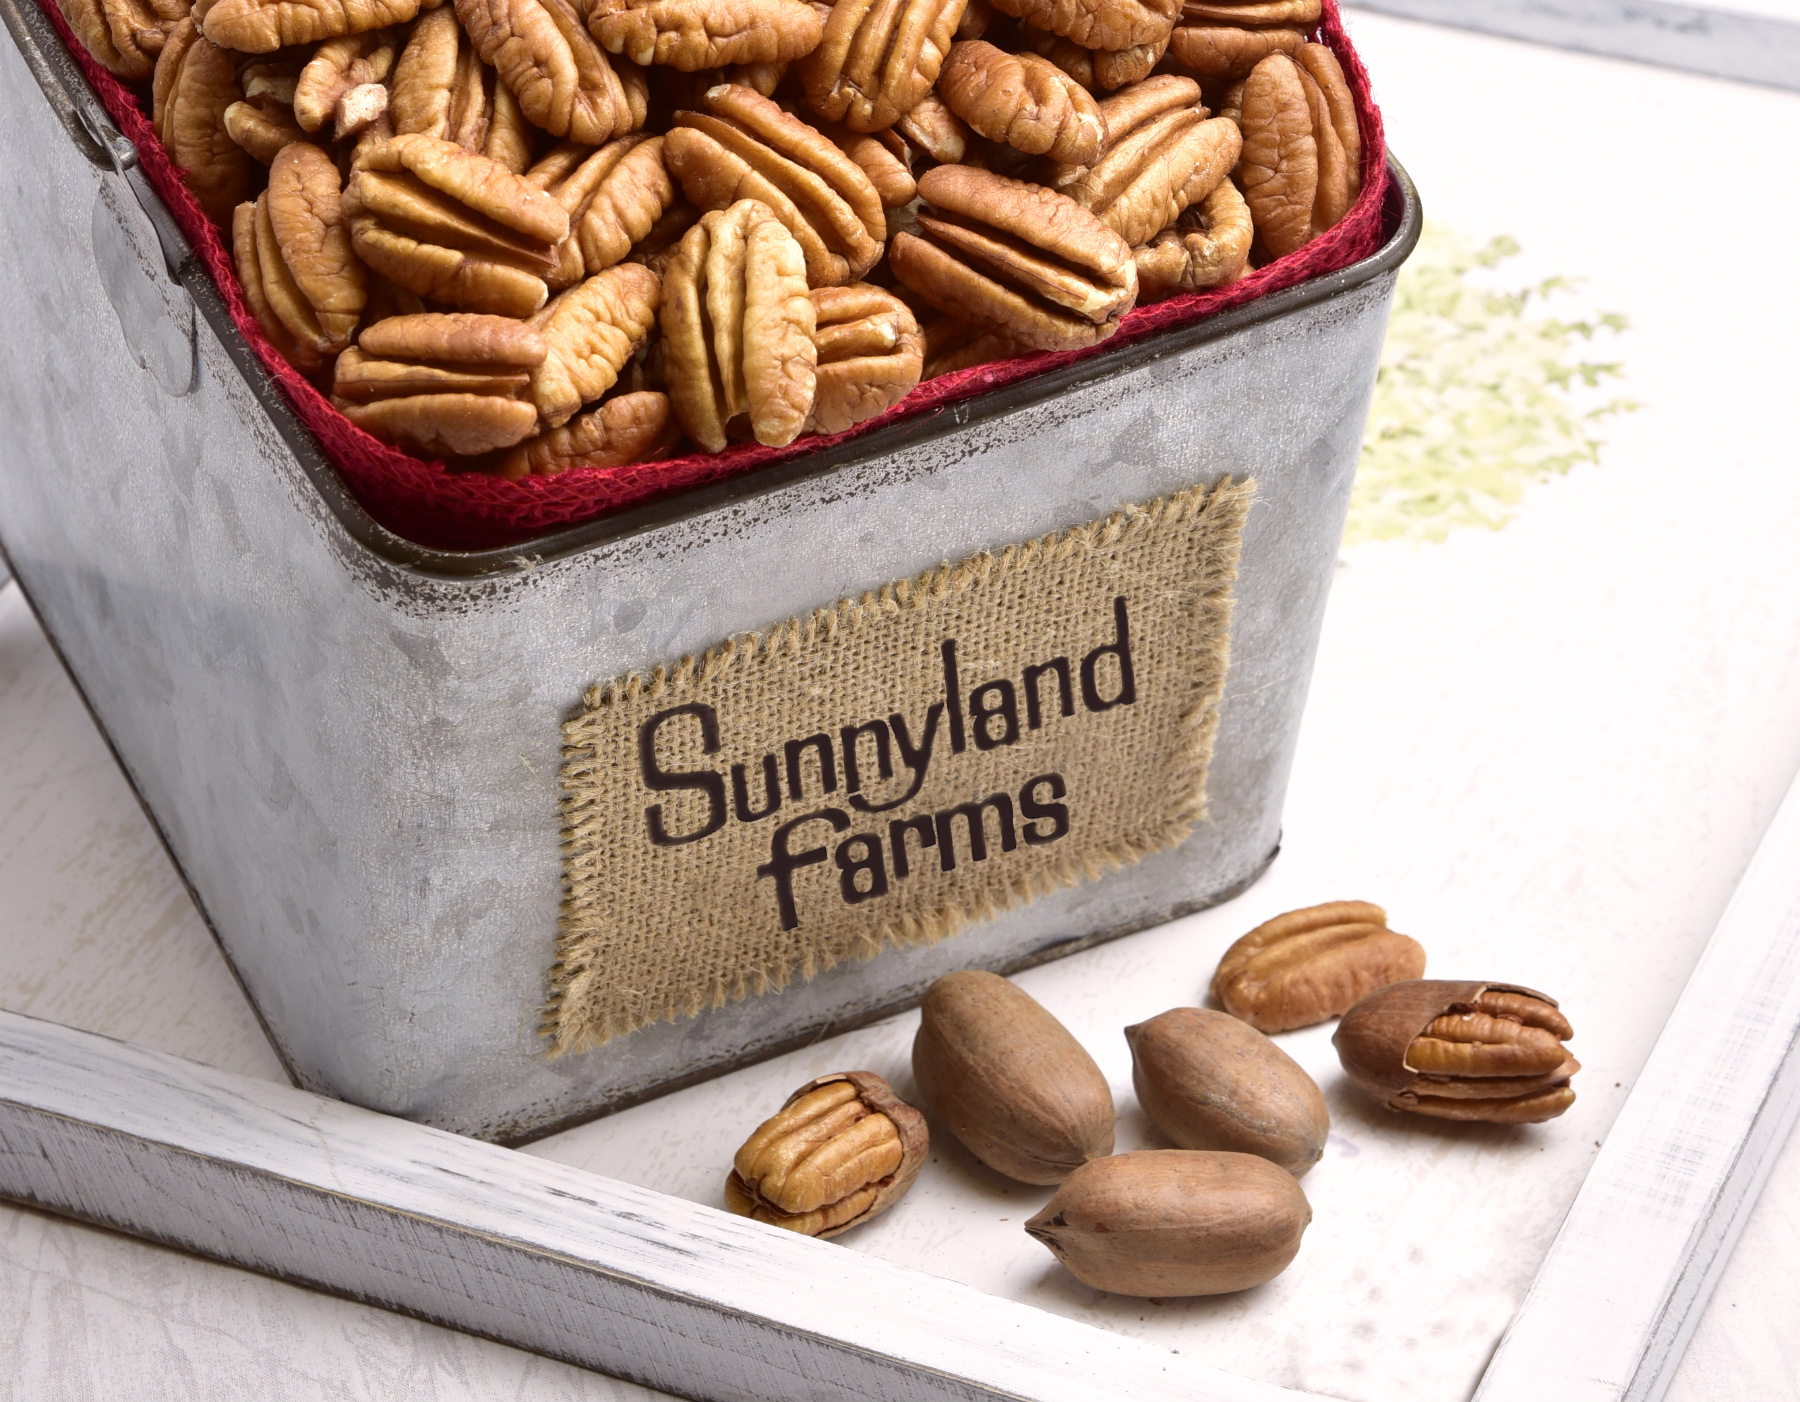 Sunnyland Farms